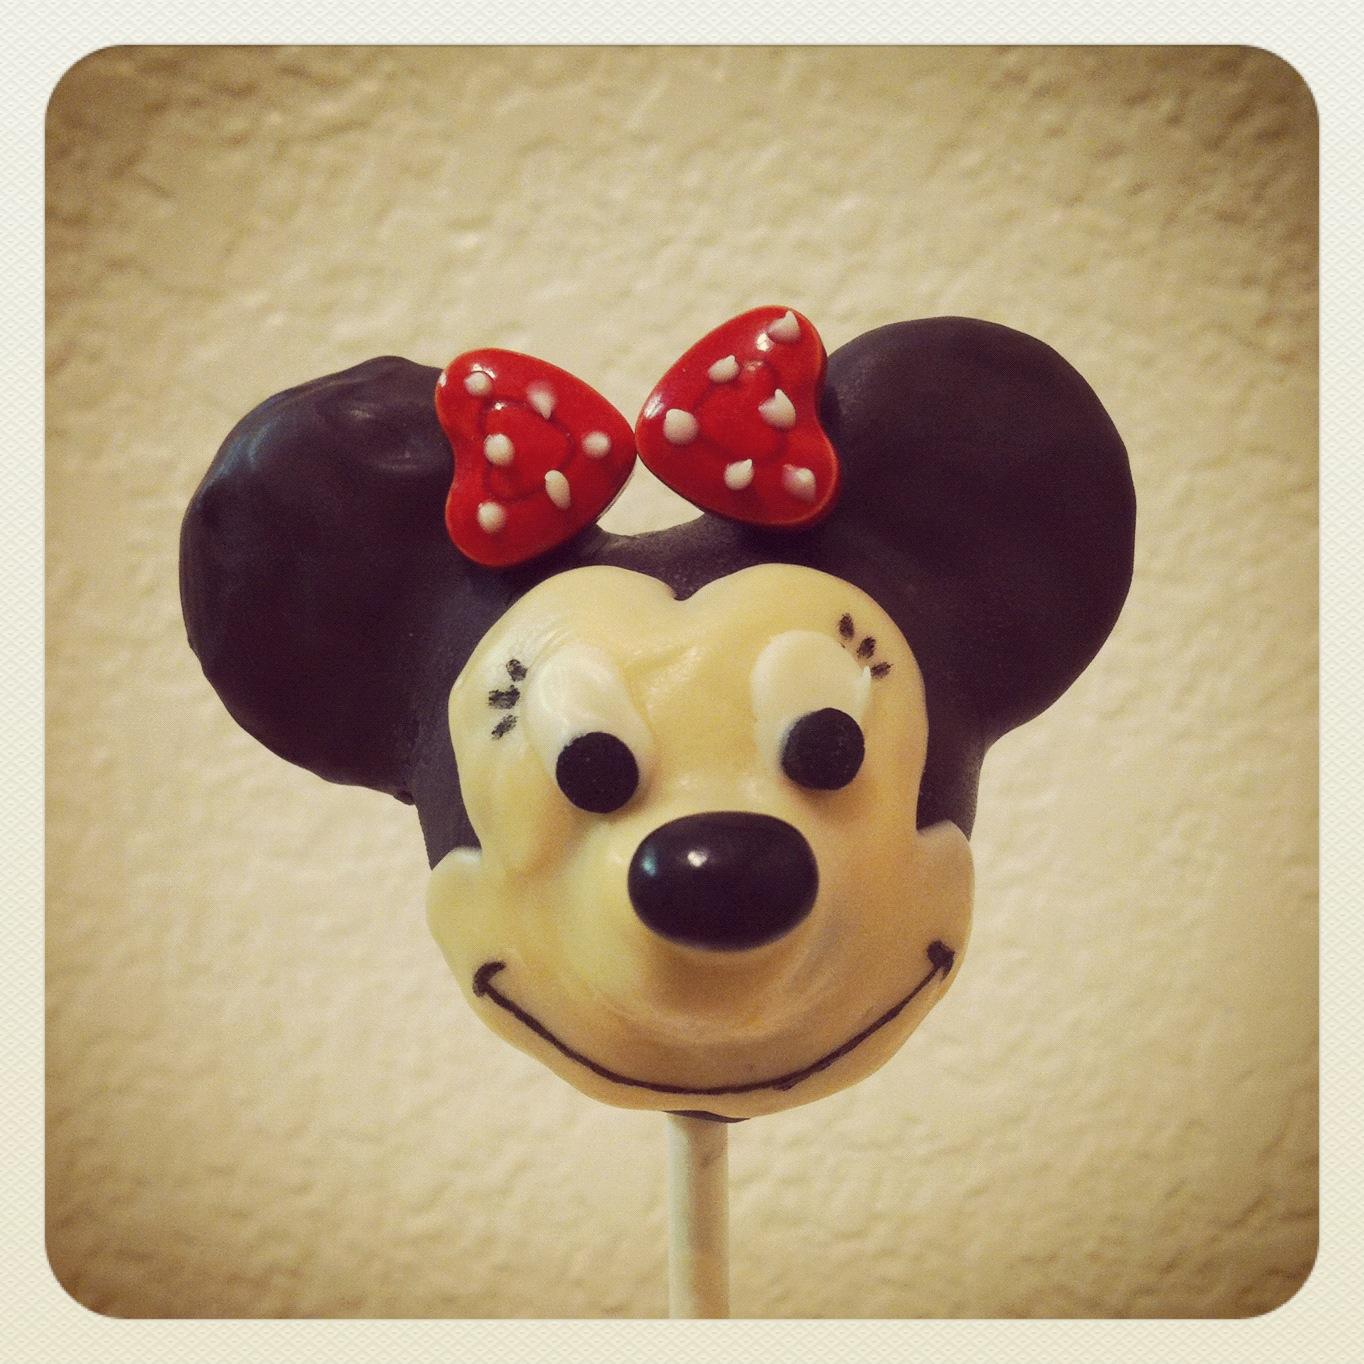 Vypassetti Cake Pops Mickey Mouse Clubhouse V2